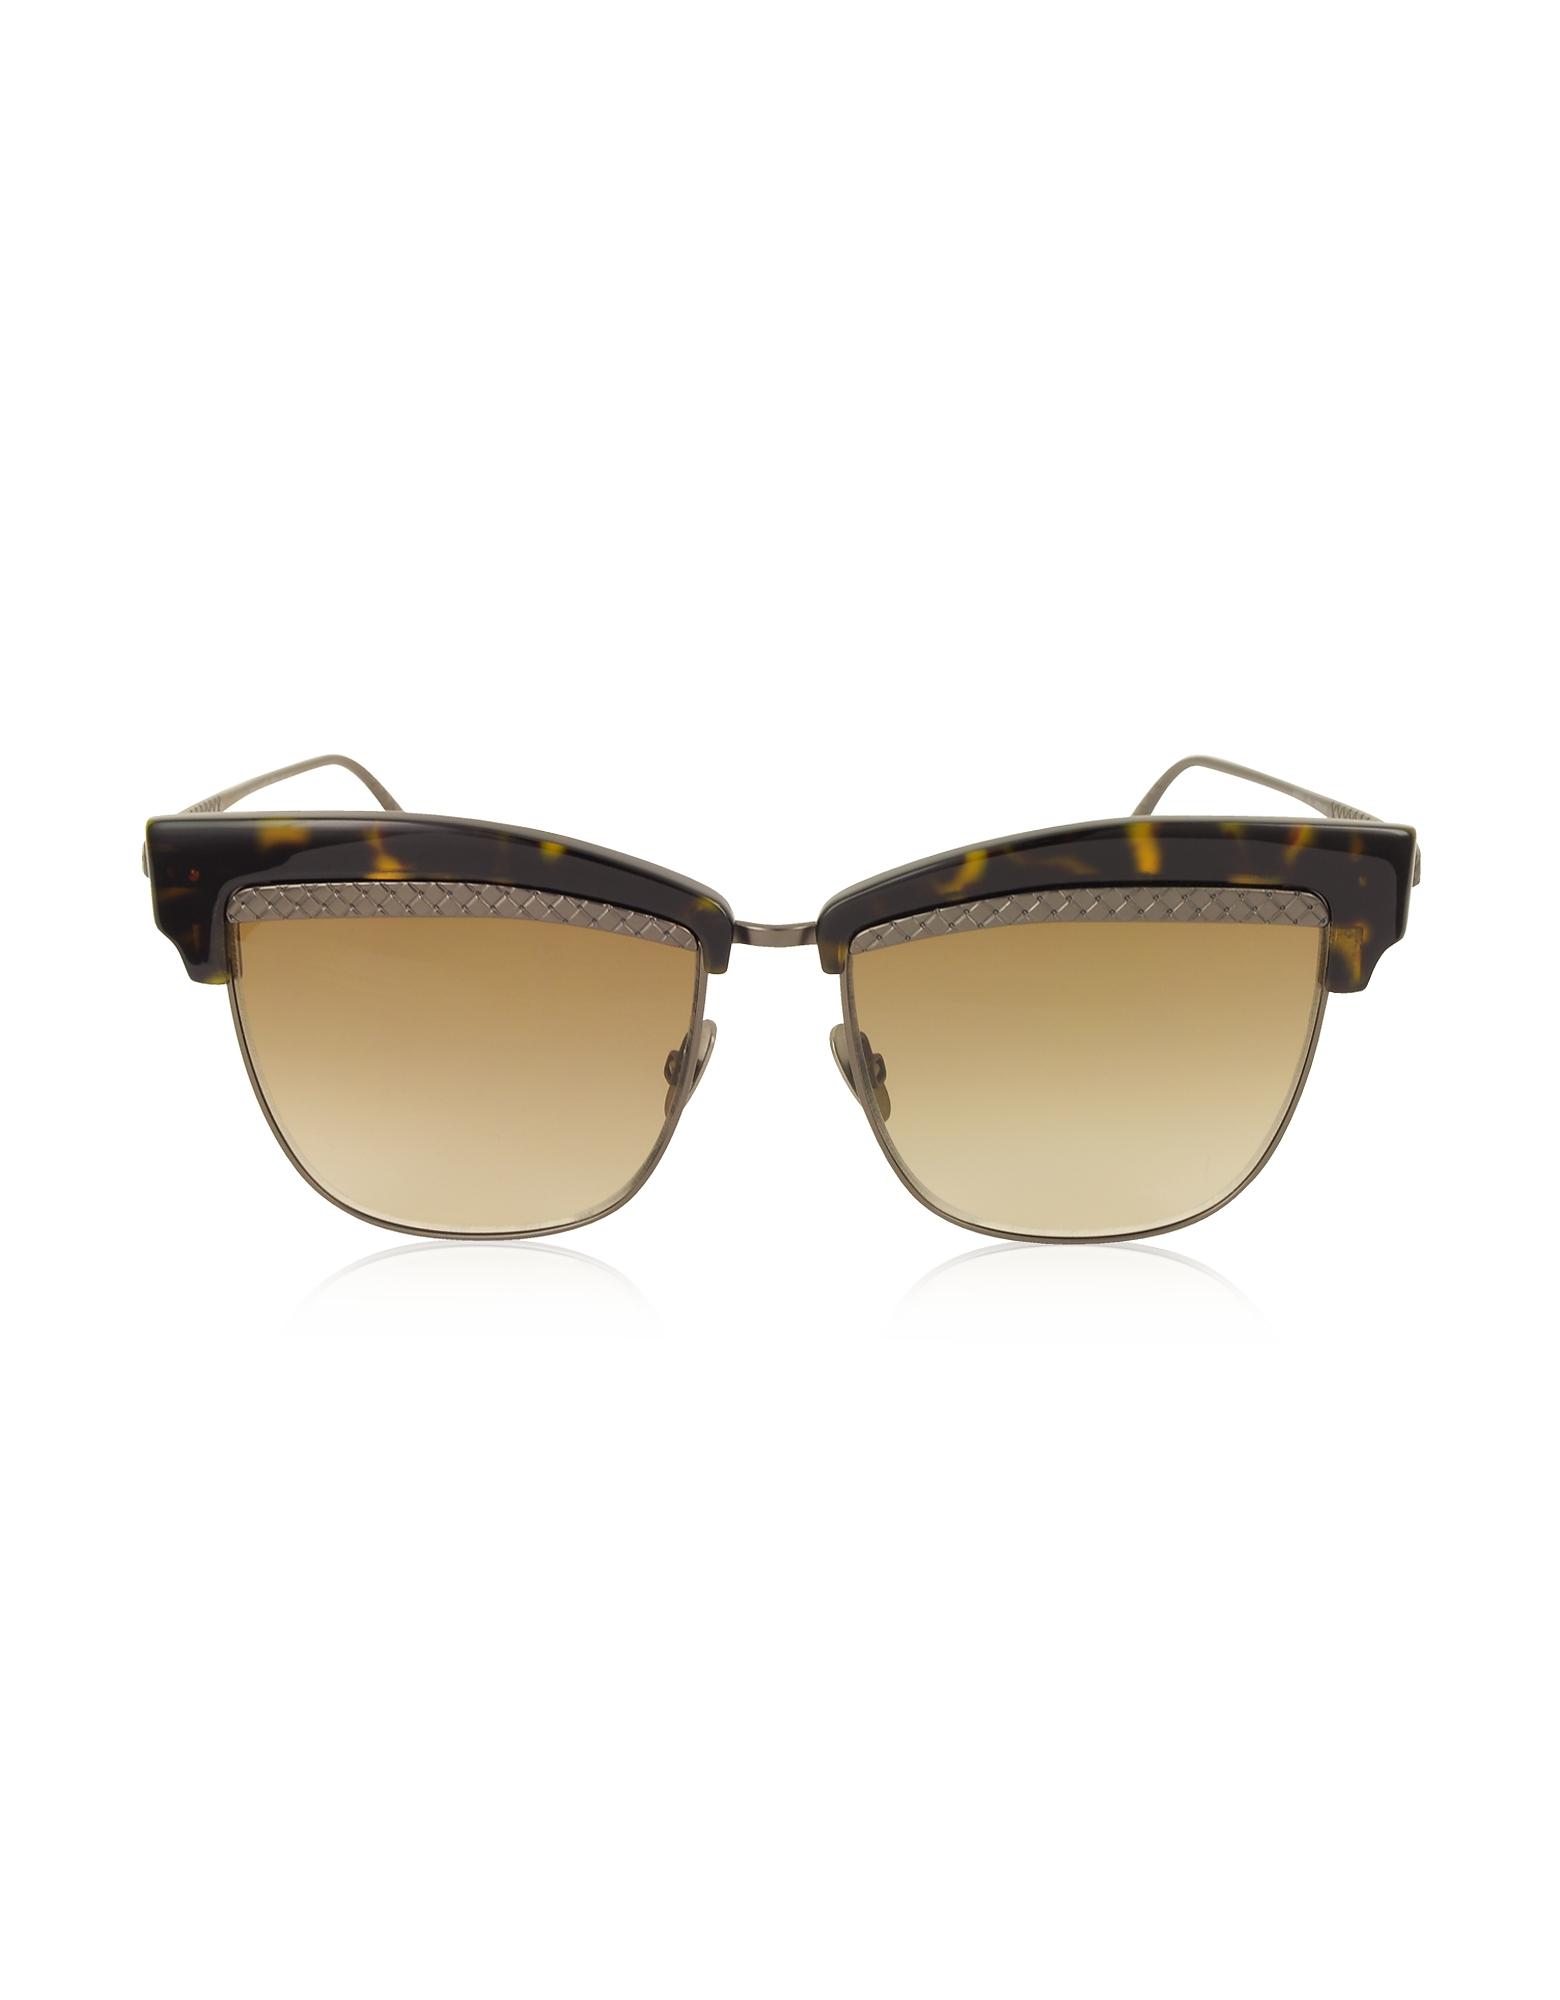 BV0075S 003 Havana Brown Metal and Acetate Women's Sunglasses